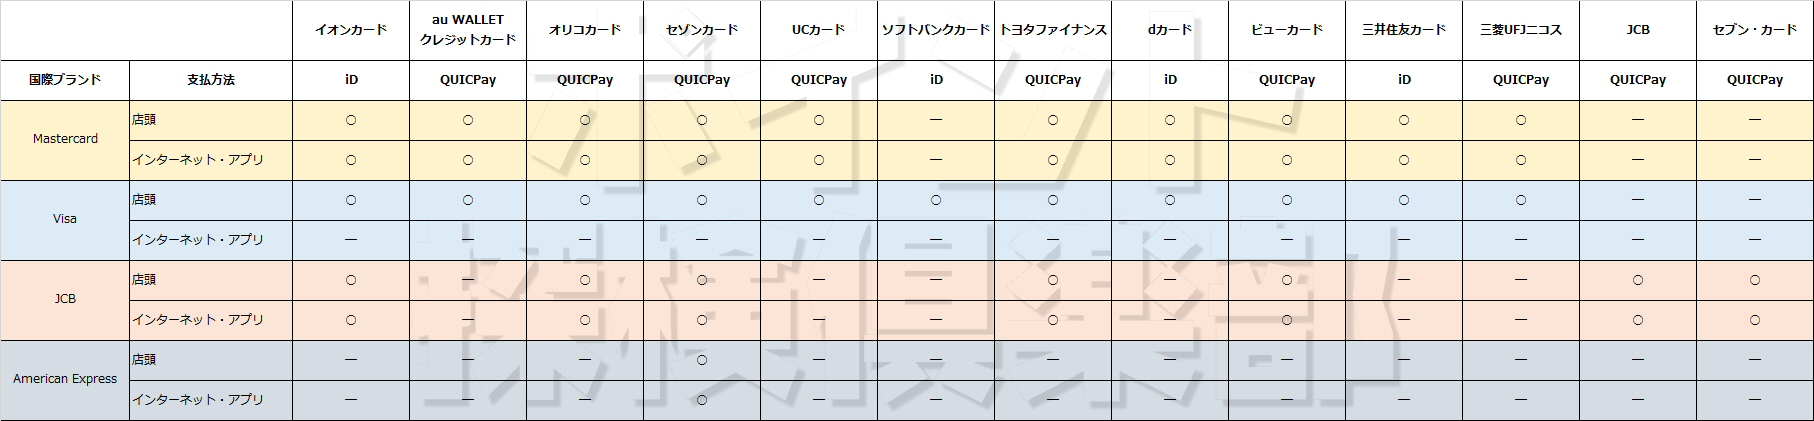 Apple Payの登録可能カードと支払い方法